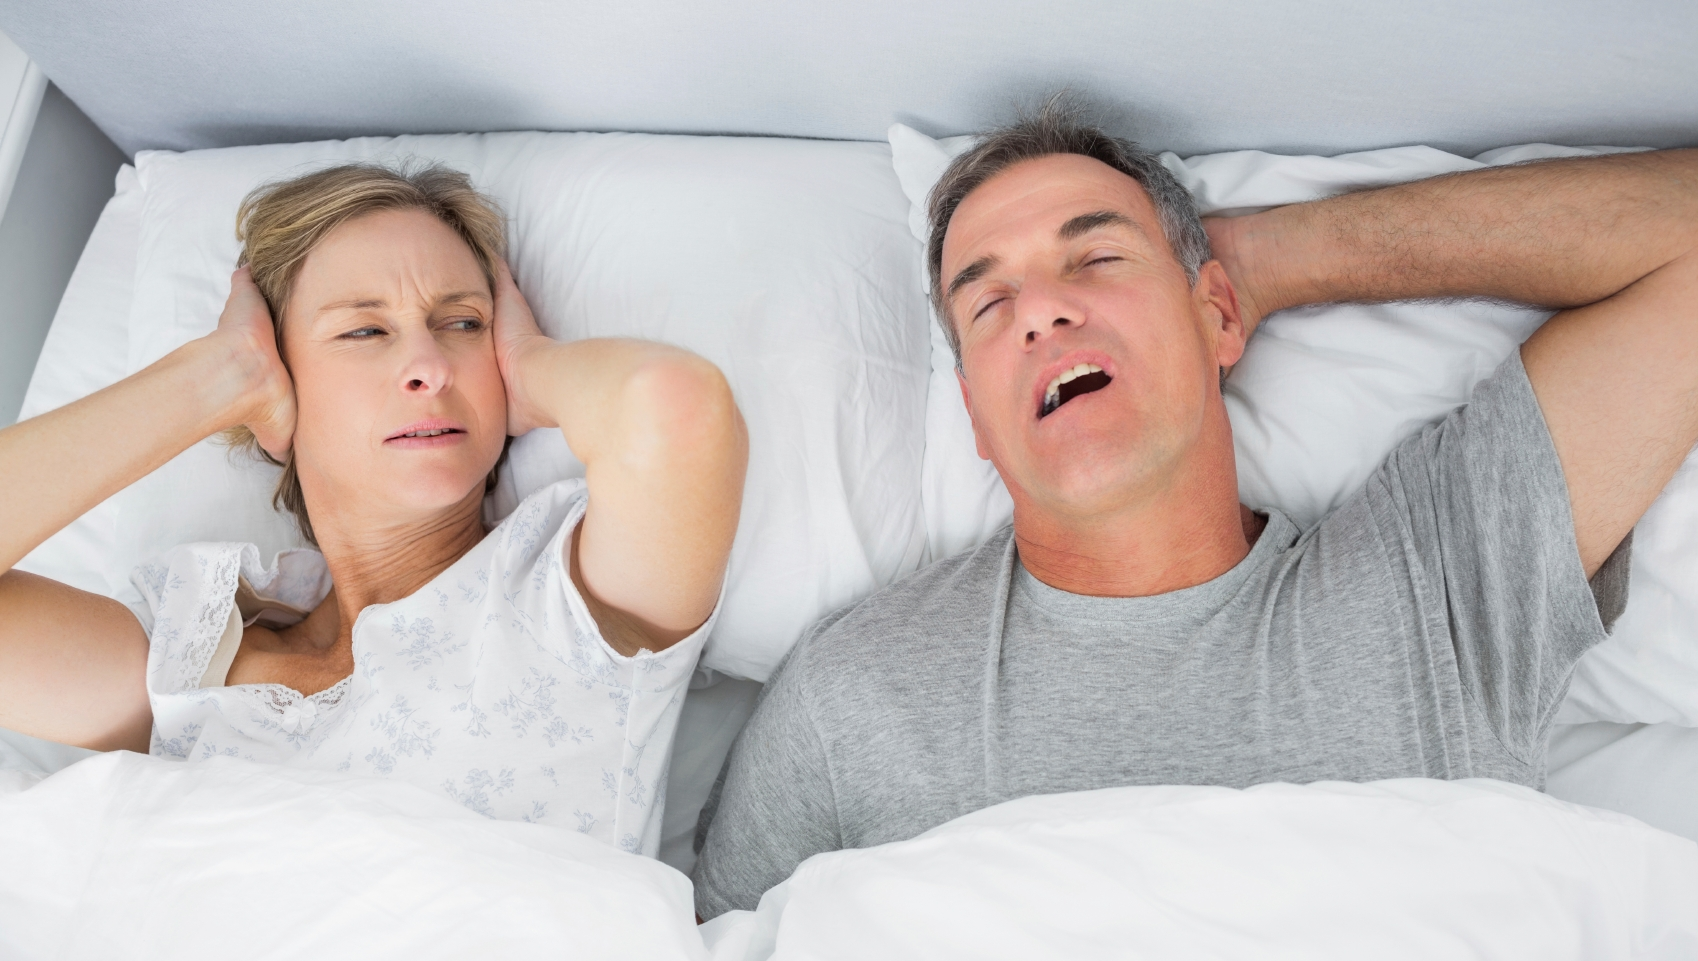 causes and treatments for sleep apnea